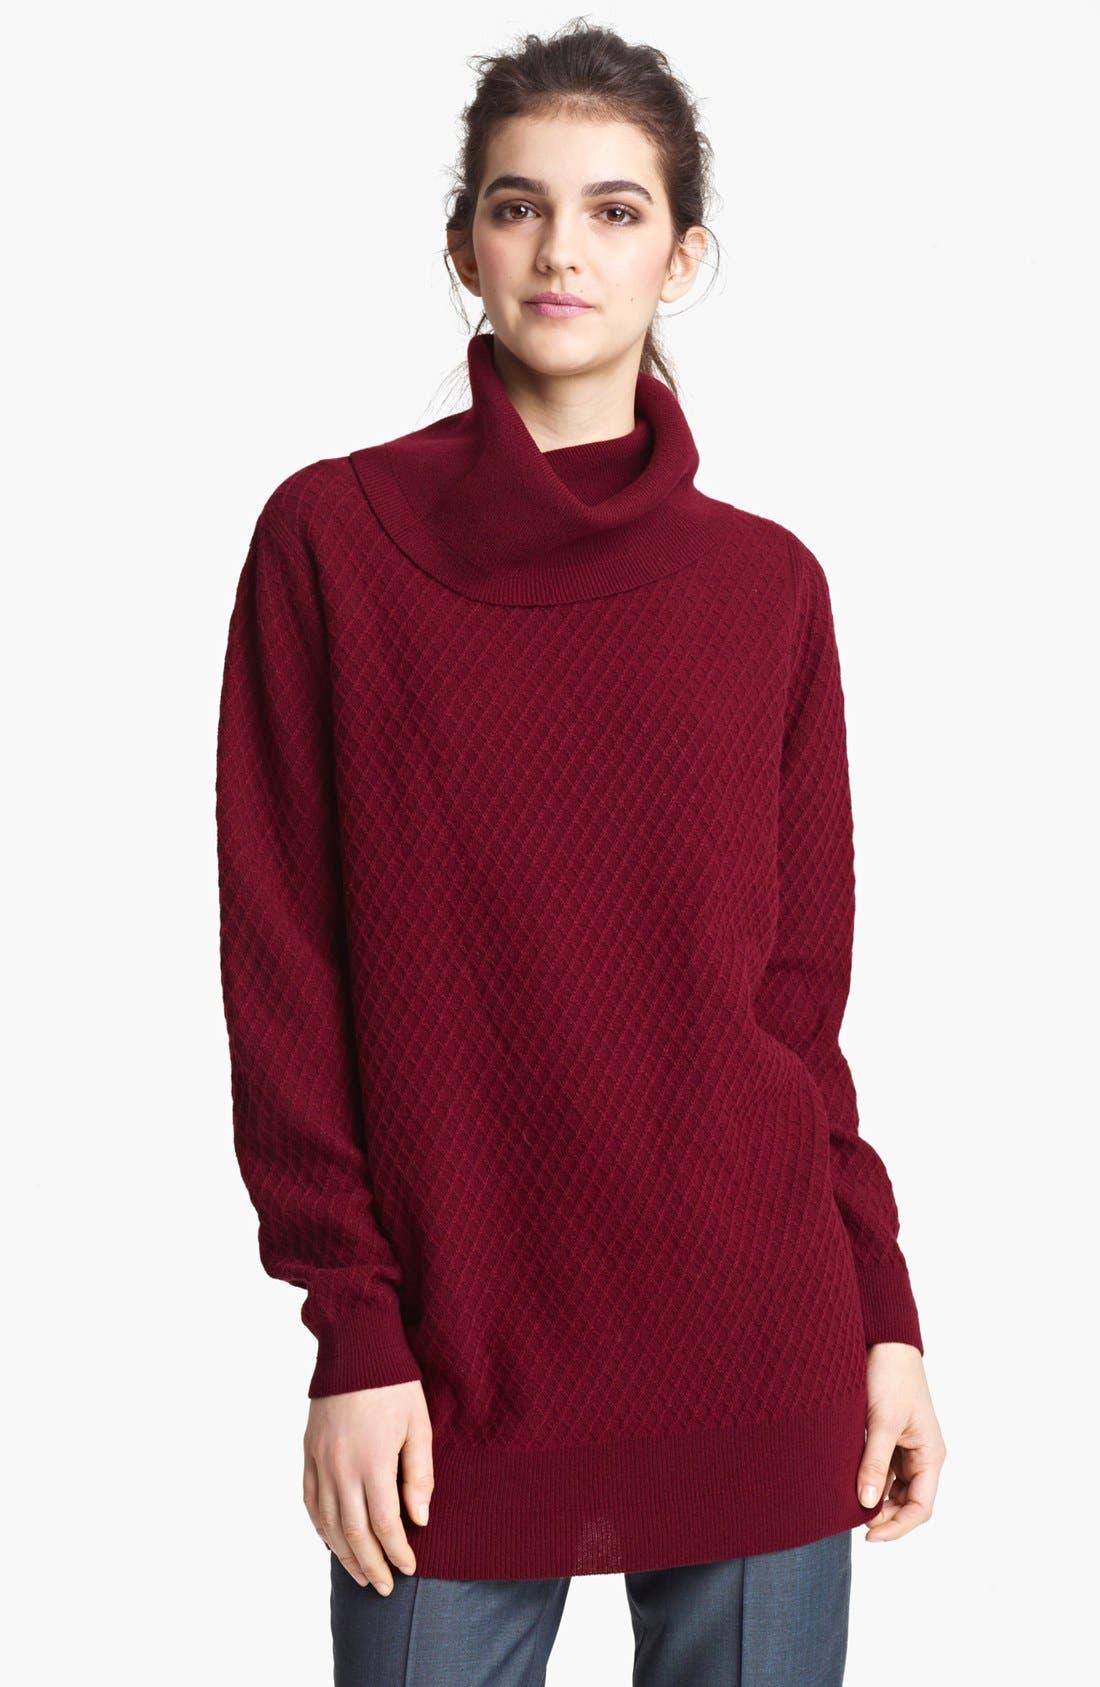 Alternate Image 1 Selected - MARC JACOBS Oversized Turtleneck Sweater